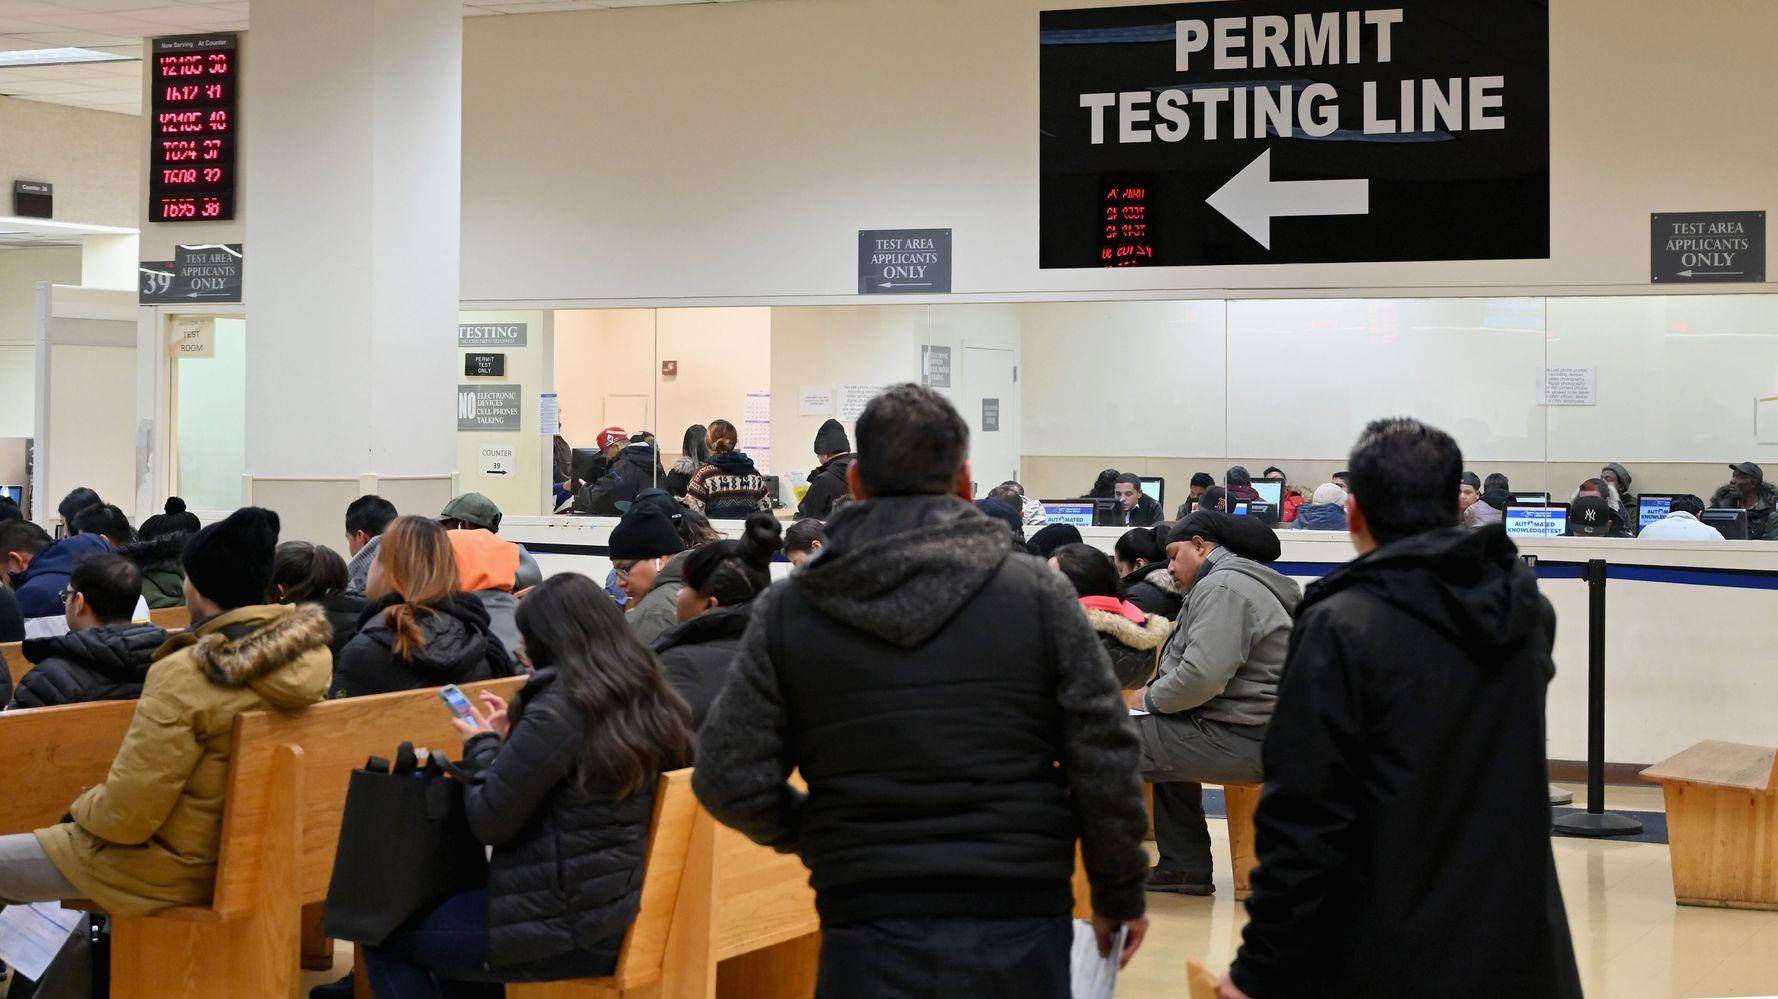 New York Plans To Offer 'X' Gender Option On Driver's Licenses